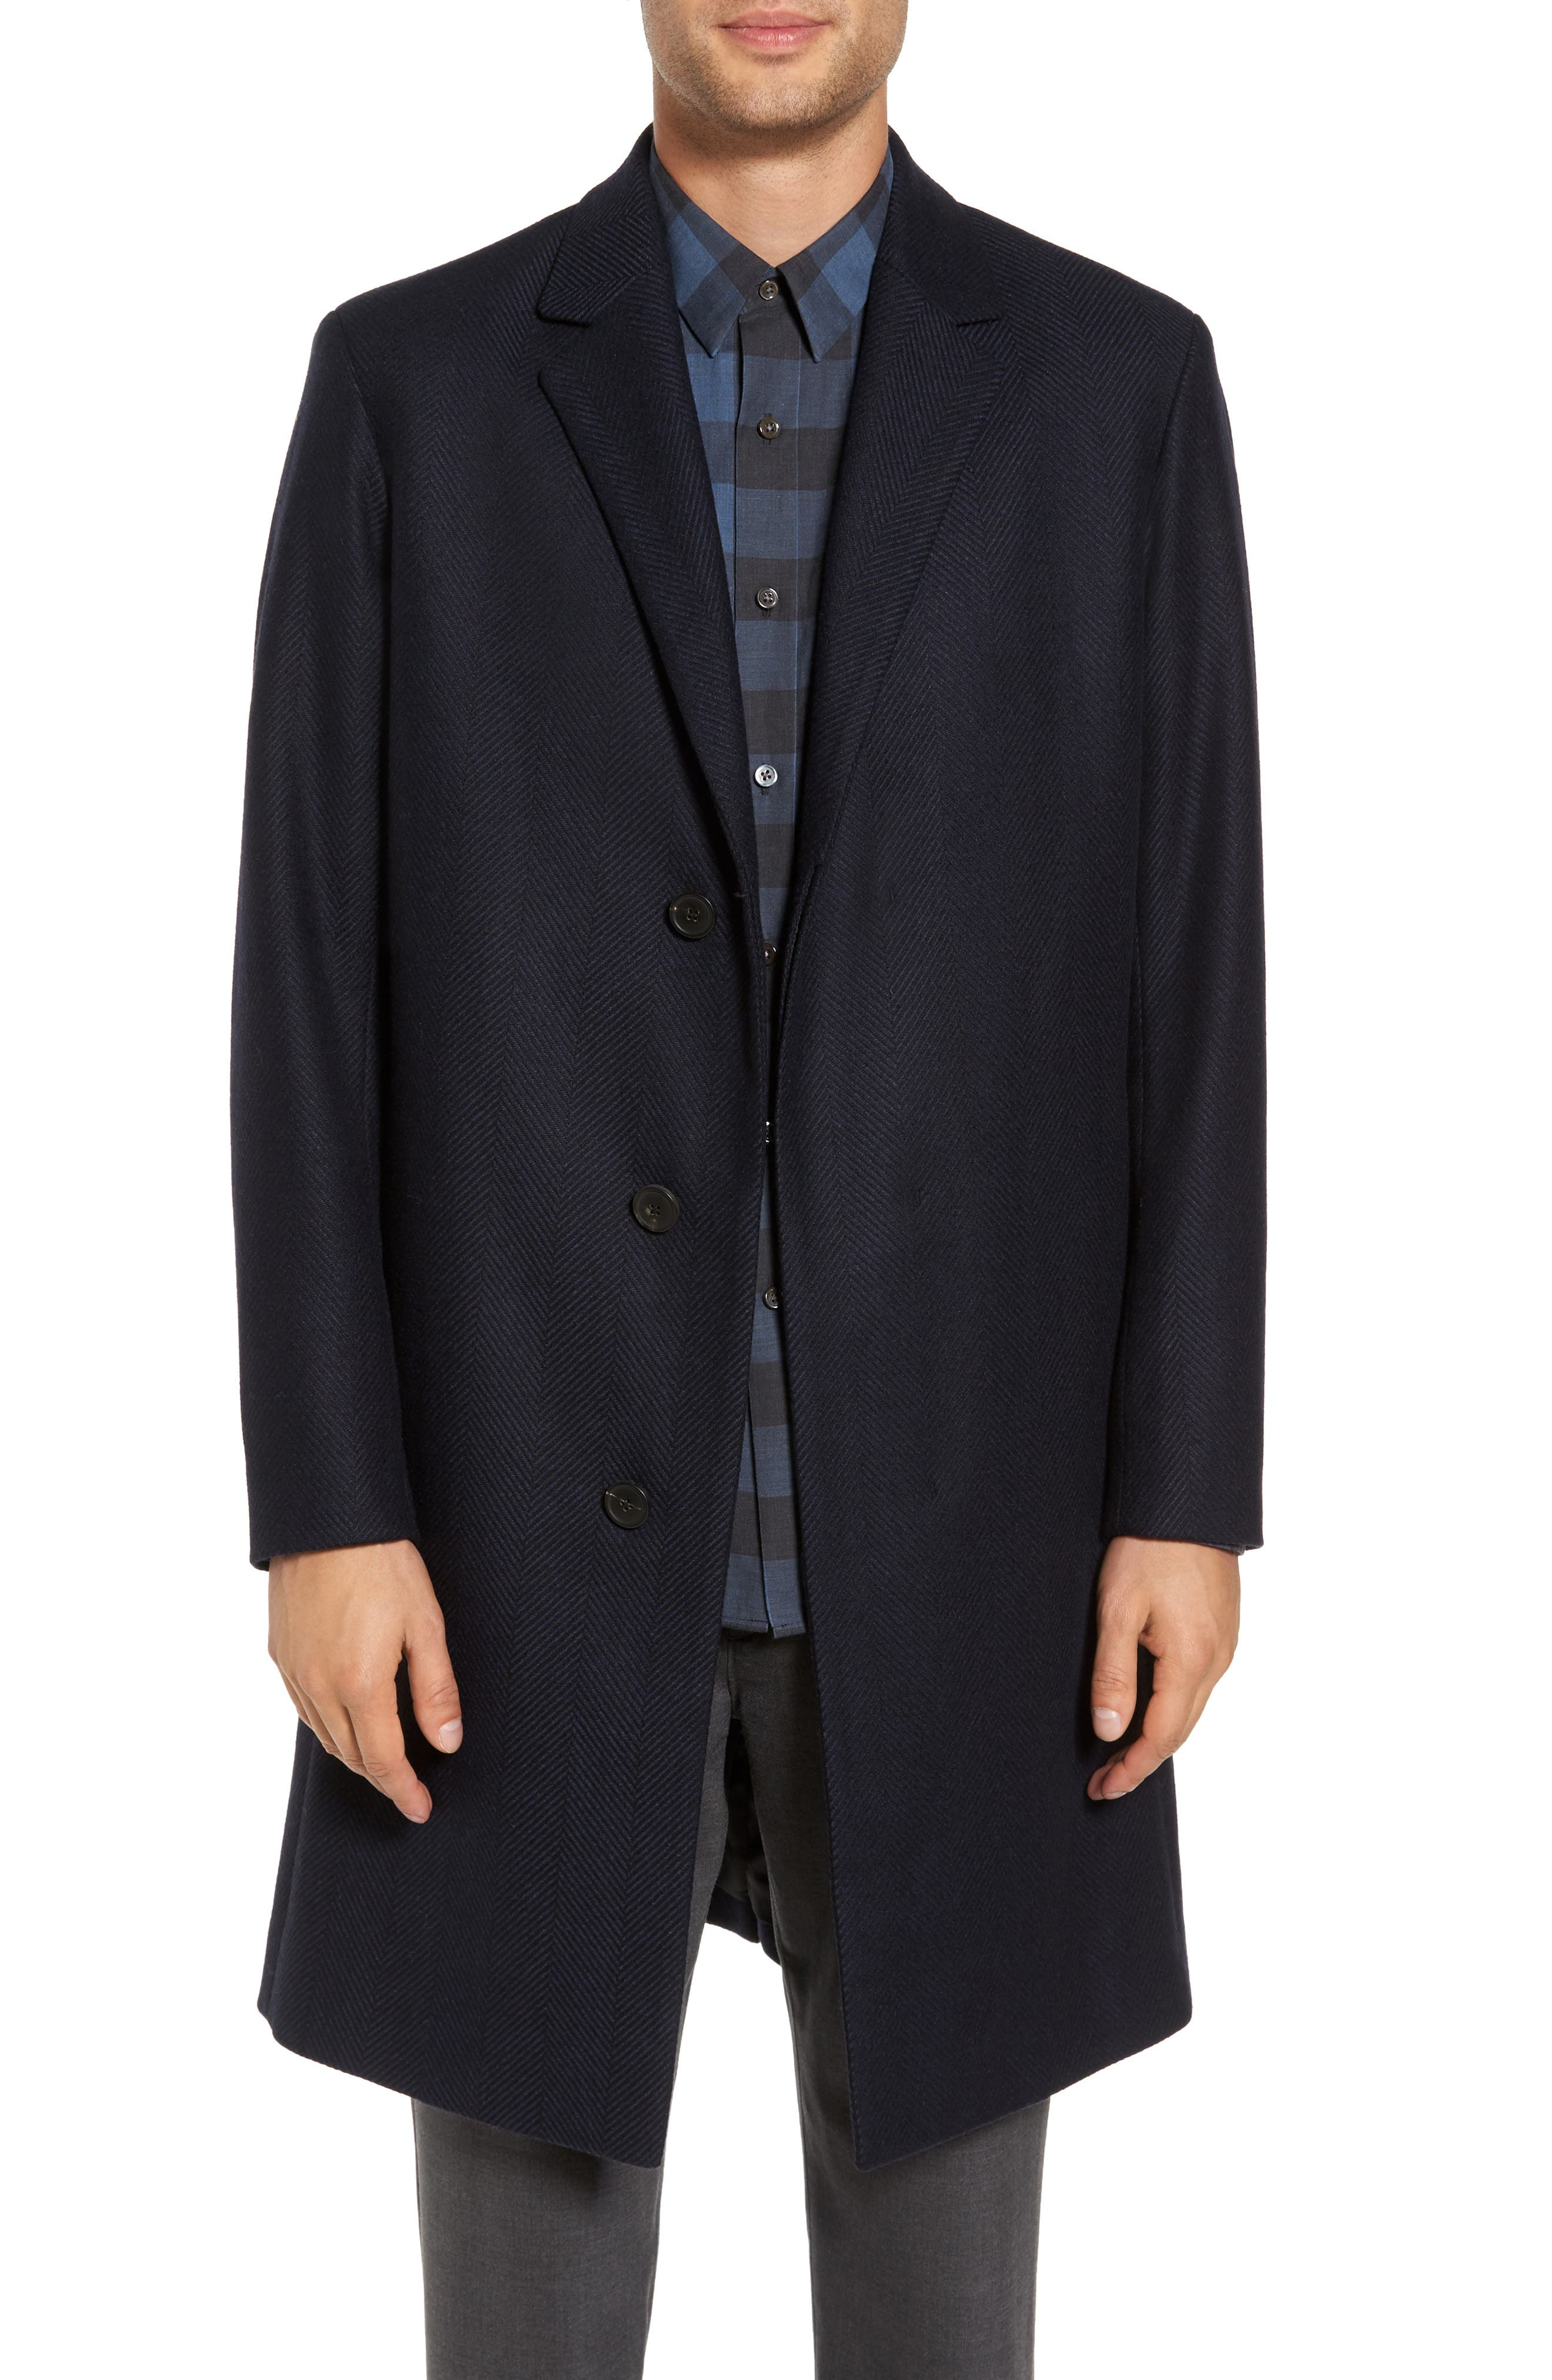 Bower Herringbone Wool Blend Topcoat,                             Main thumbnail 1, color,                             Liberty Multi